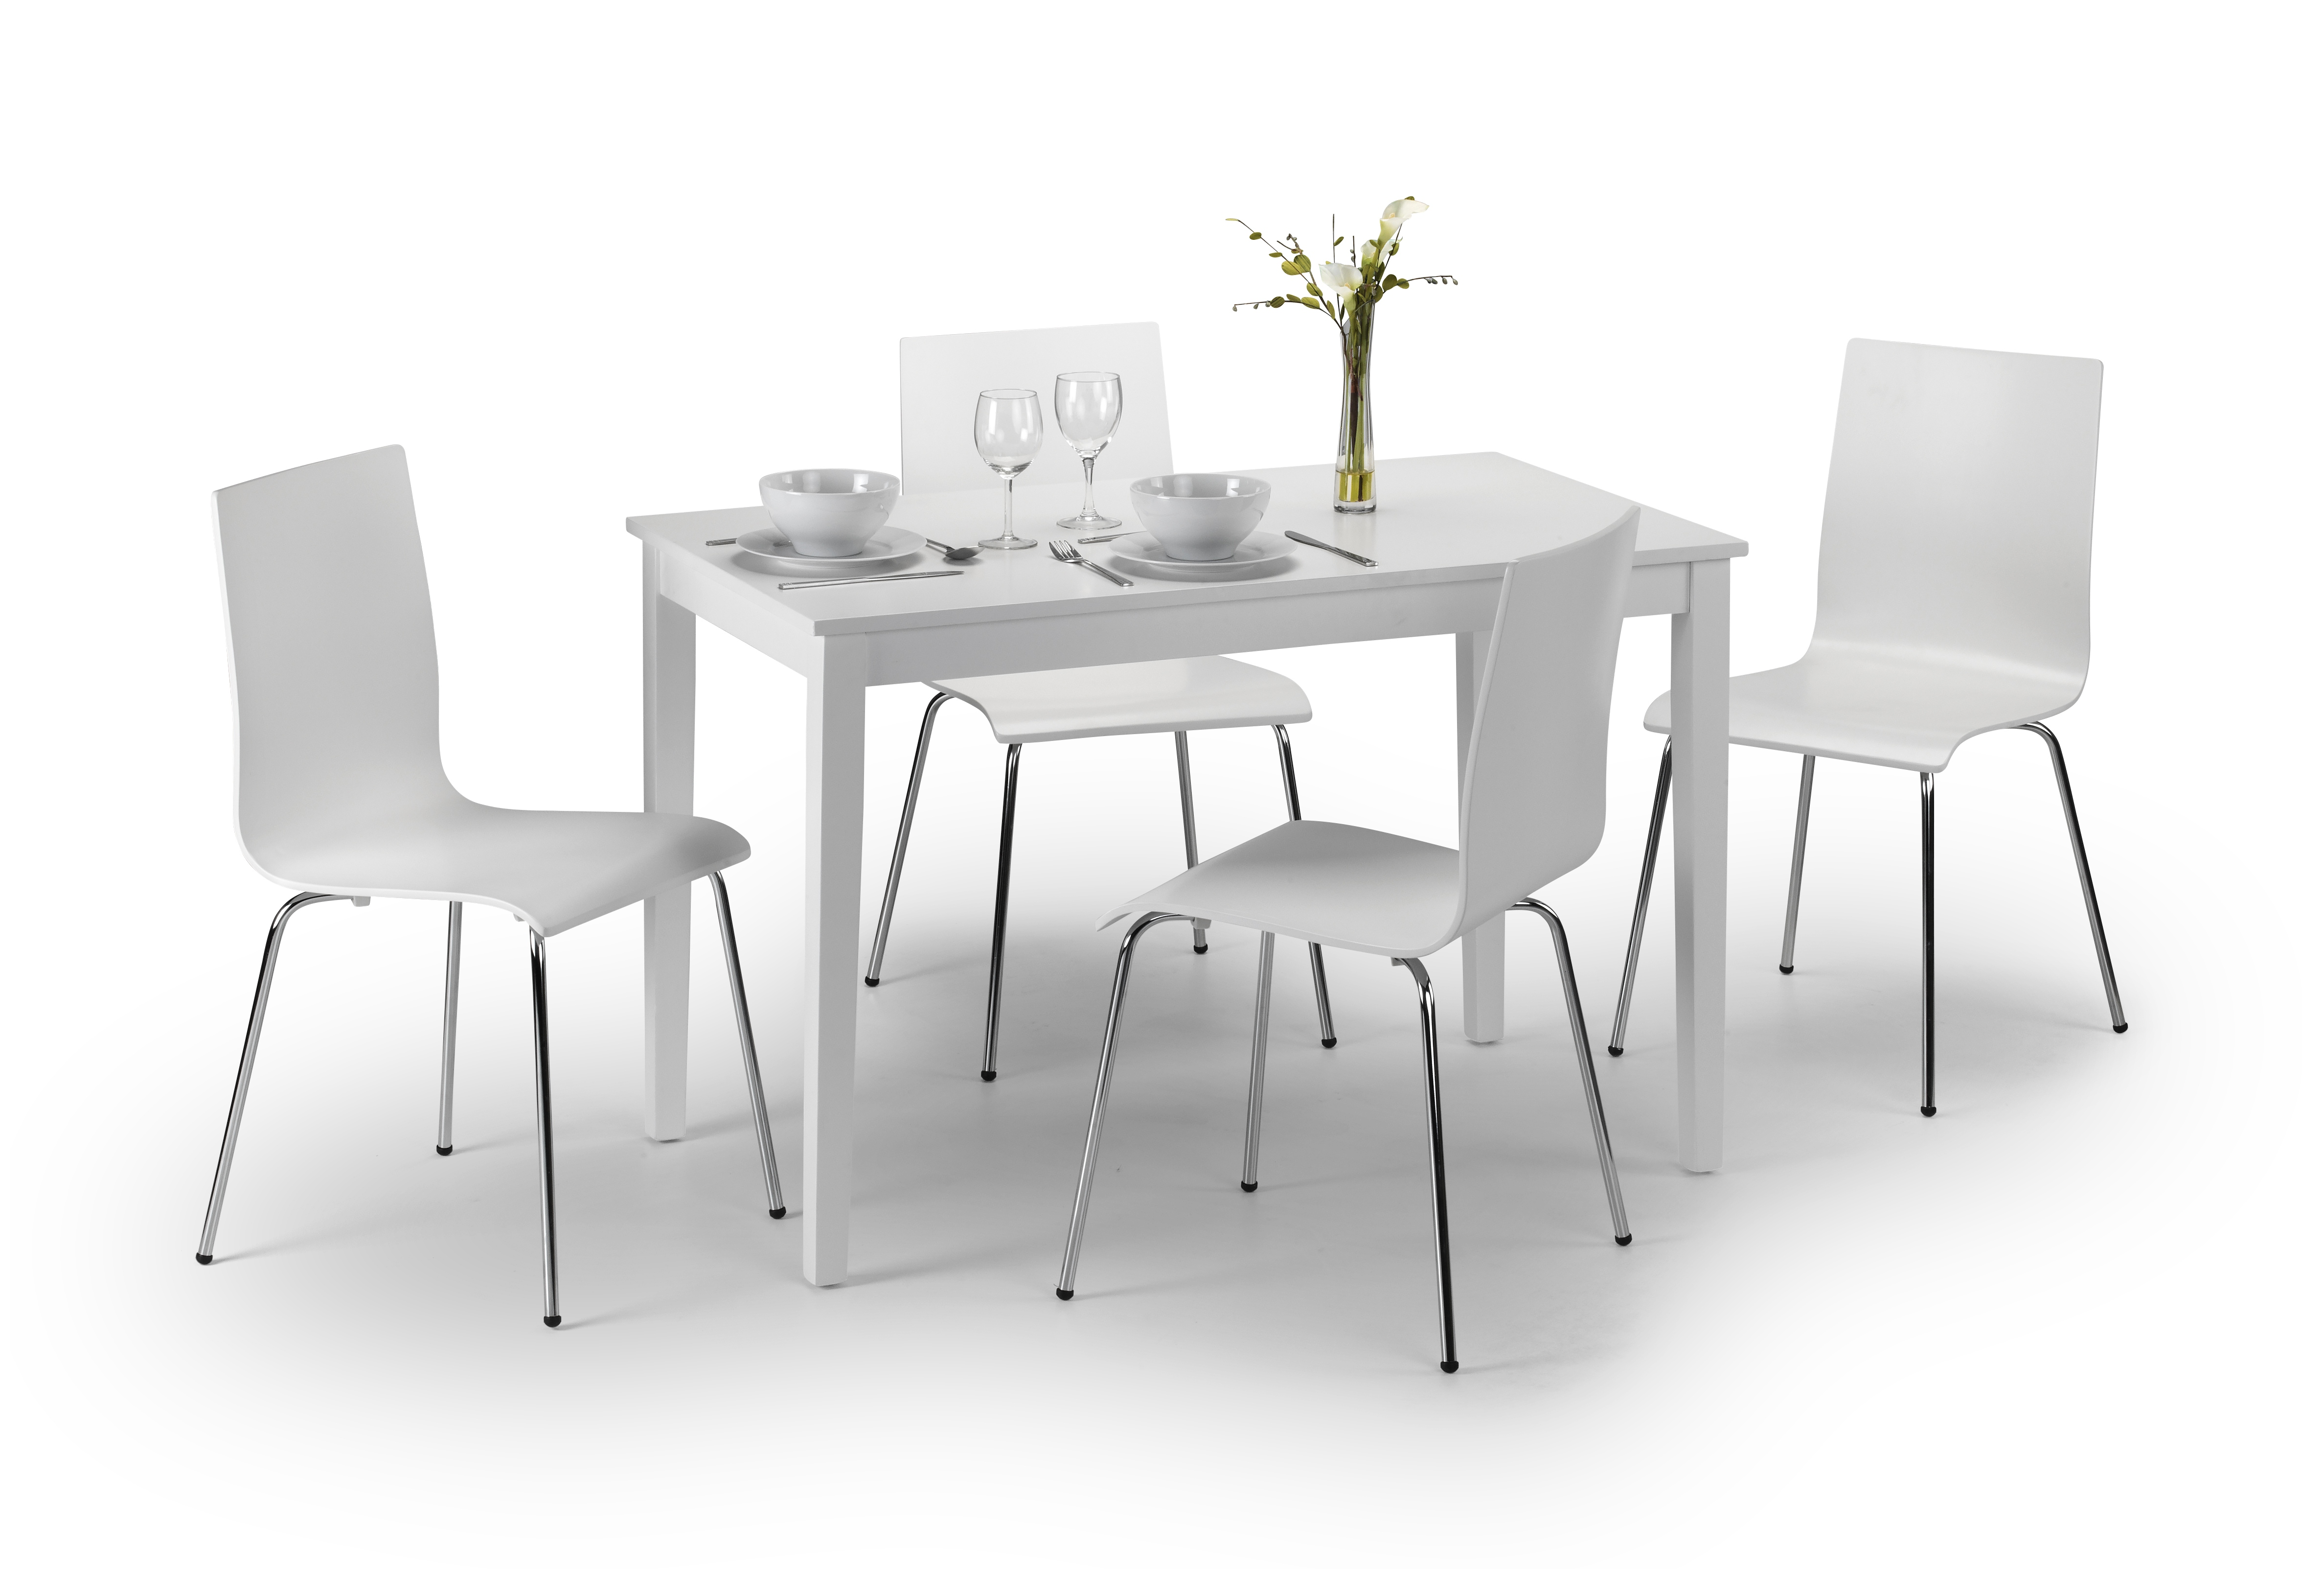 Taku Dining Set with 4 Chairs